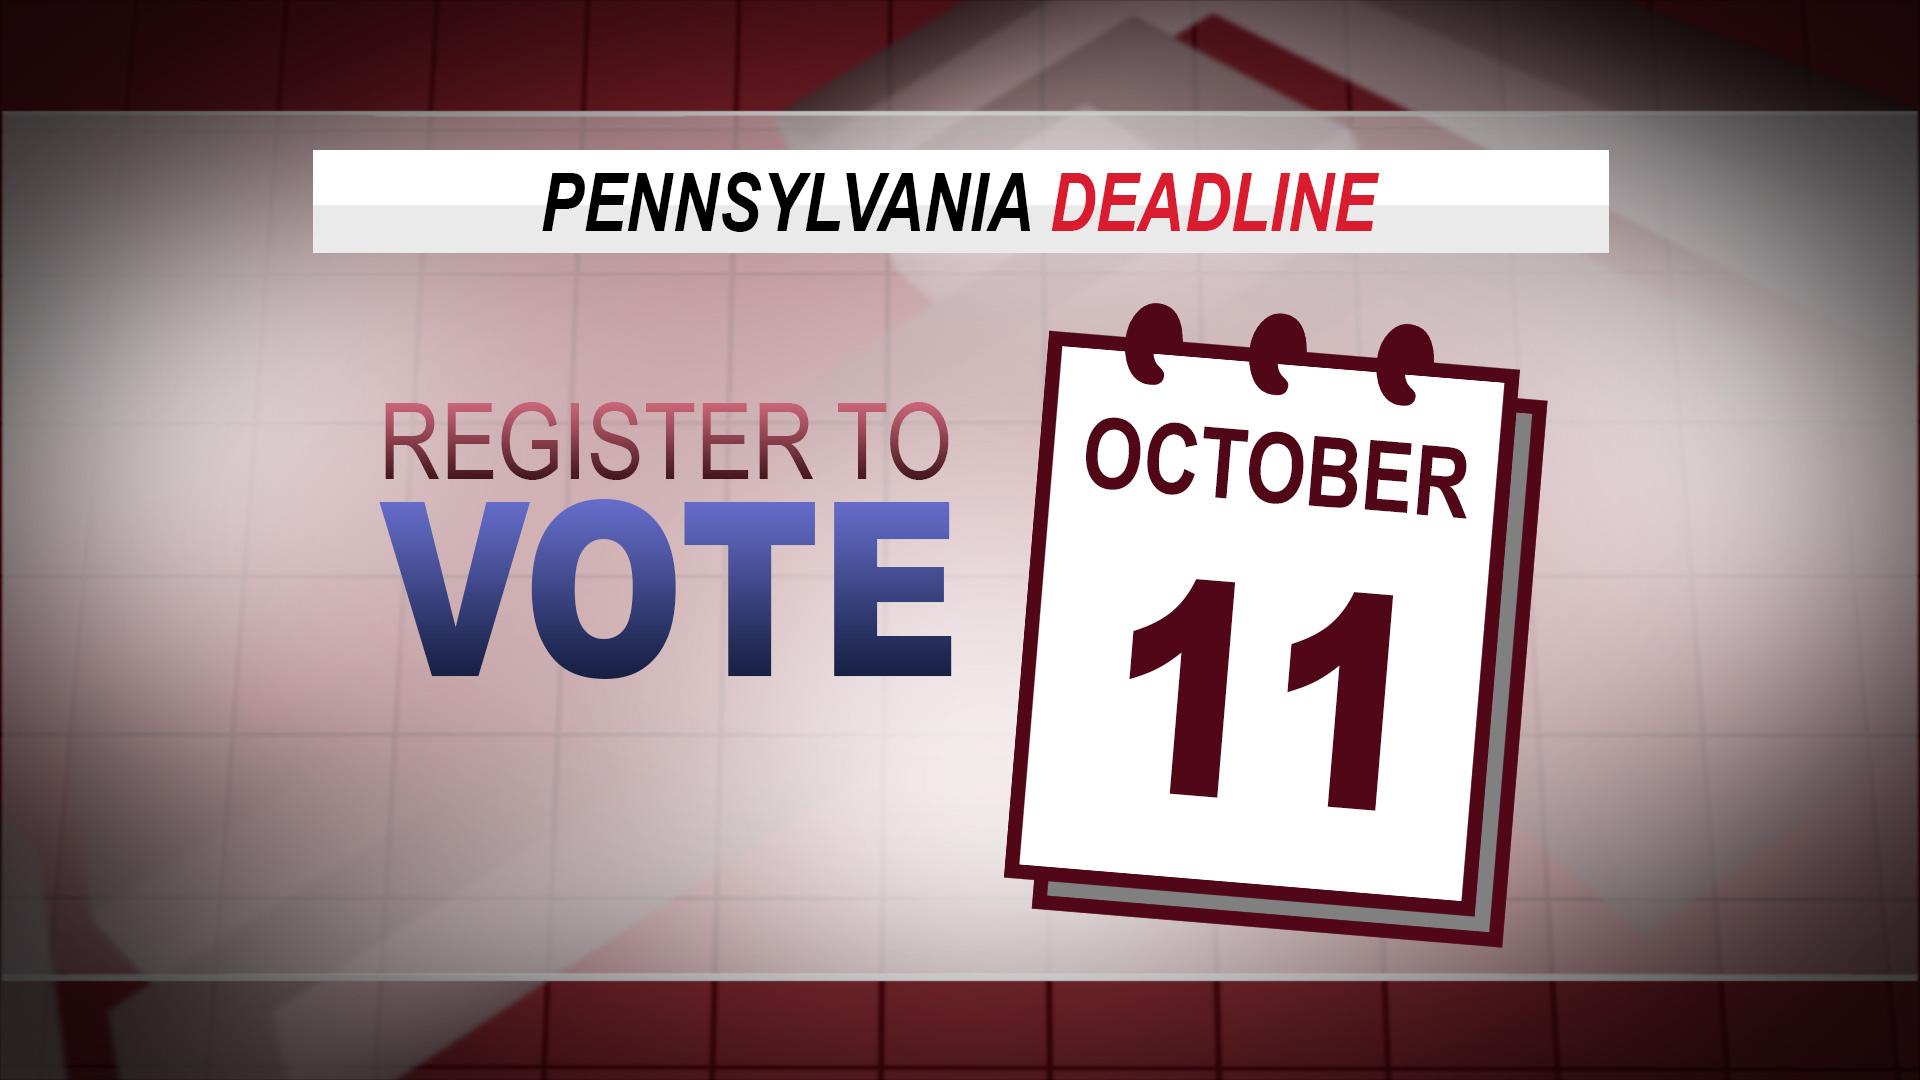 Pennsylvania Voter Registration Deadline Approach